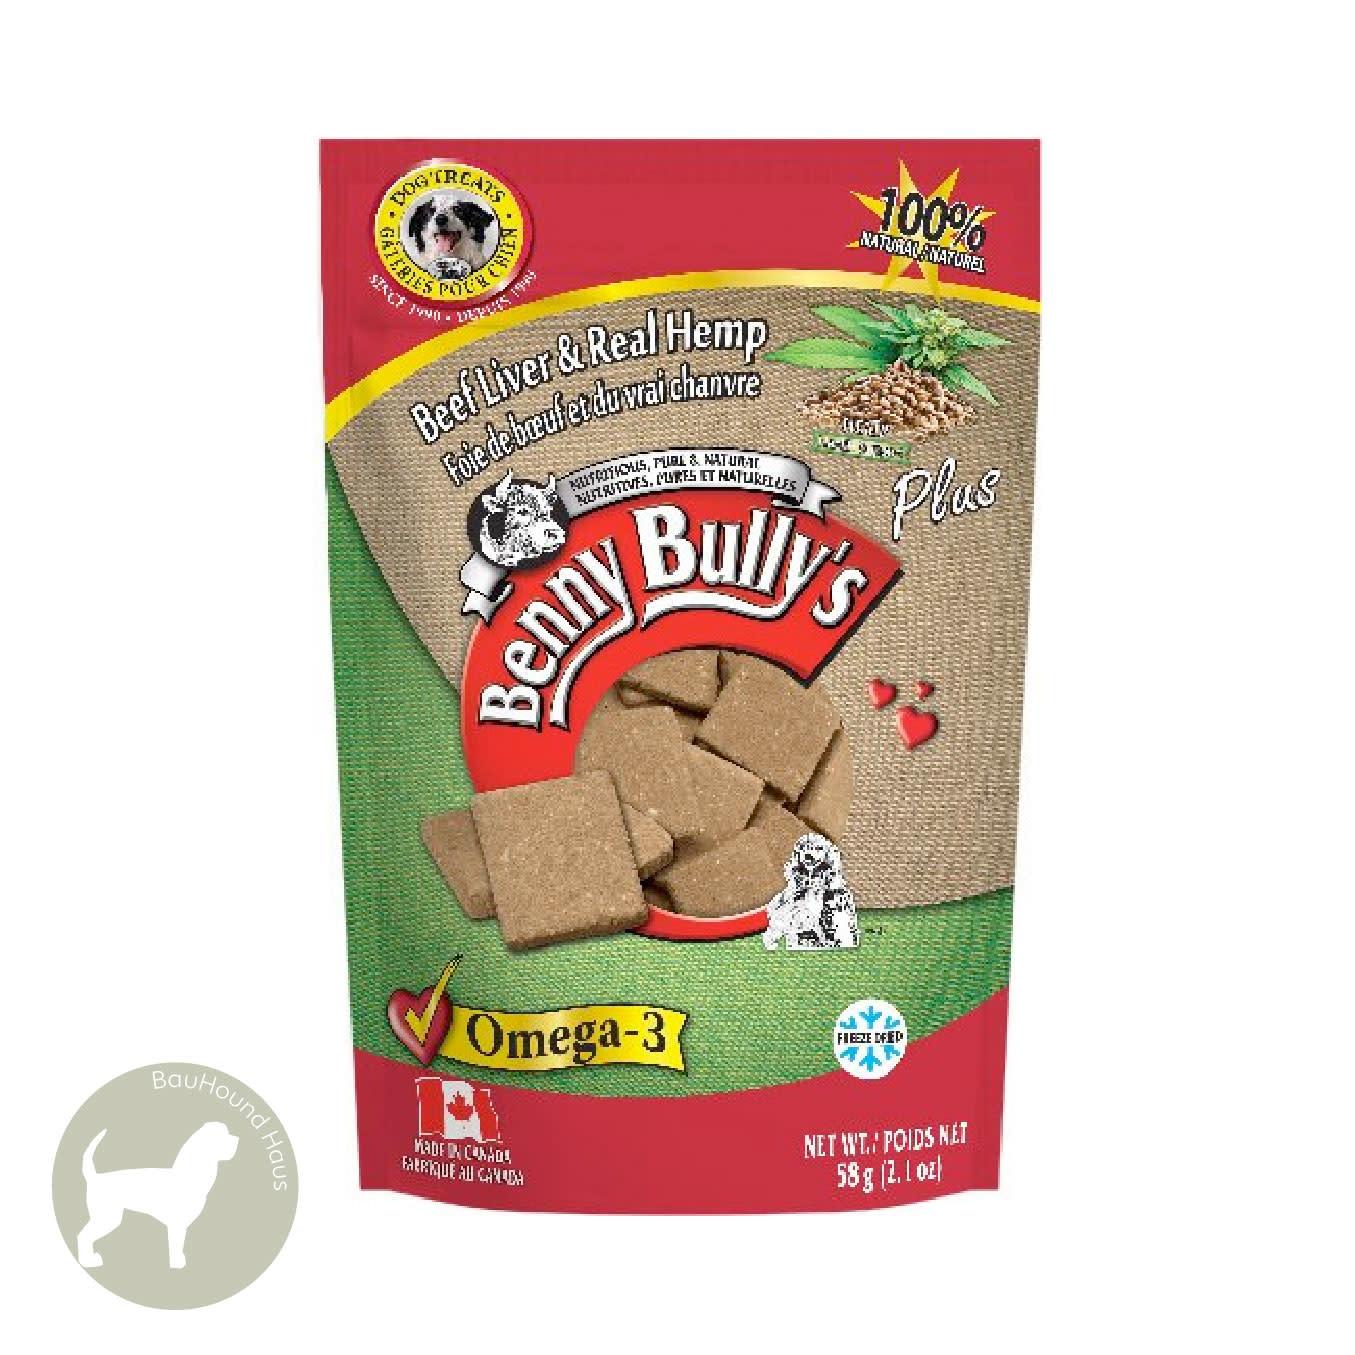 Benny Bully's Benny Bully's Beef Liver Plus Hemp Treats, 58g